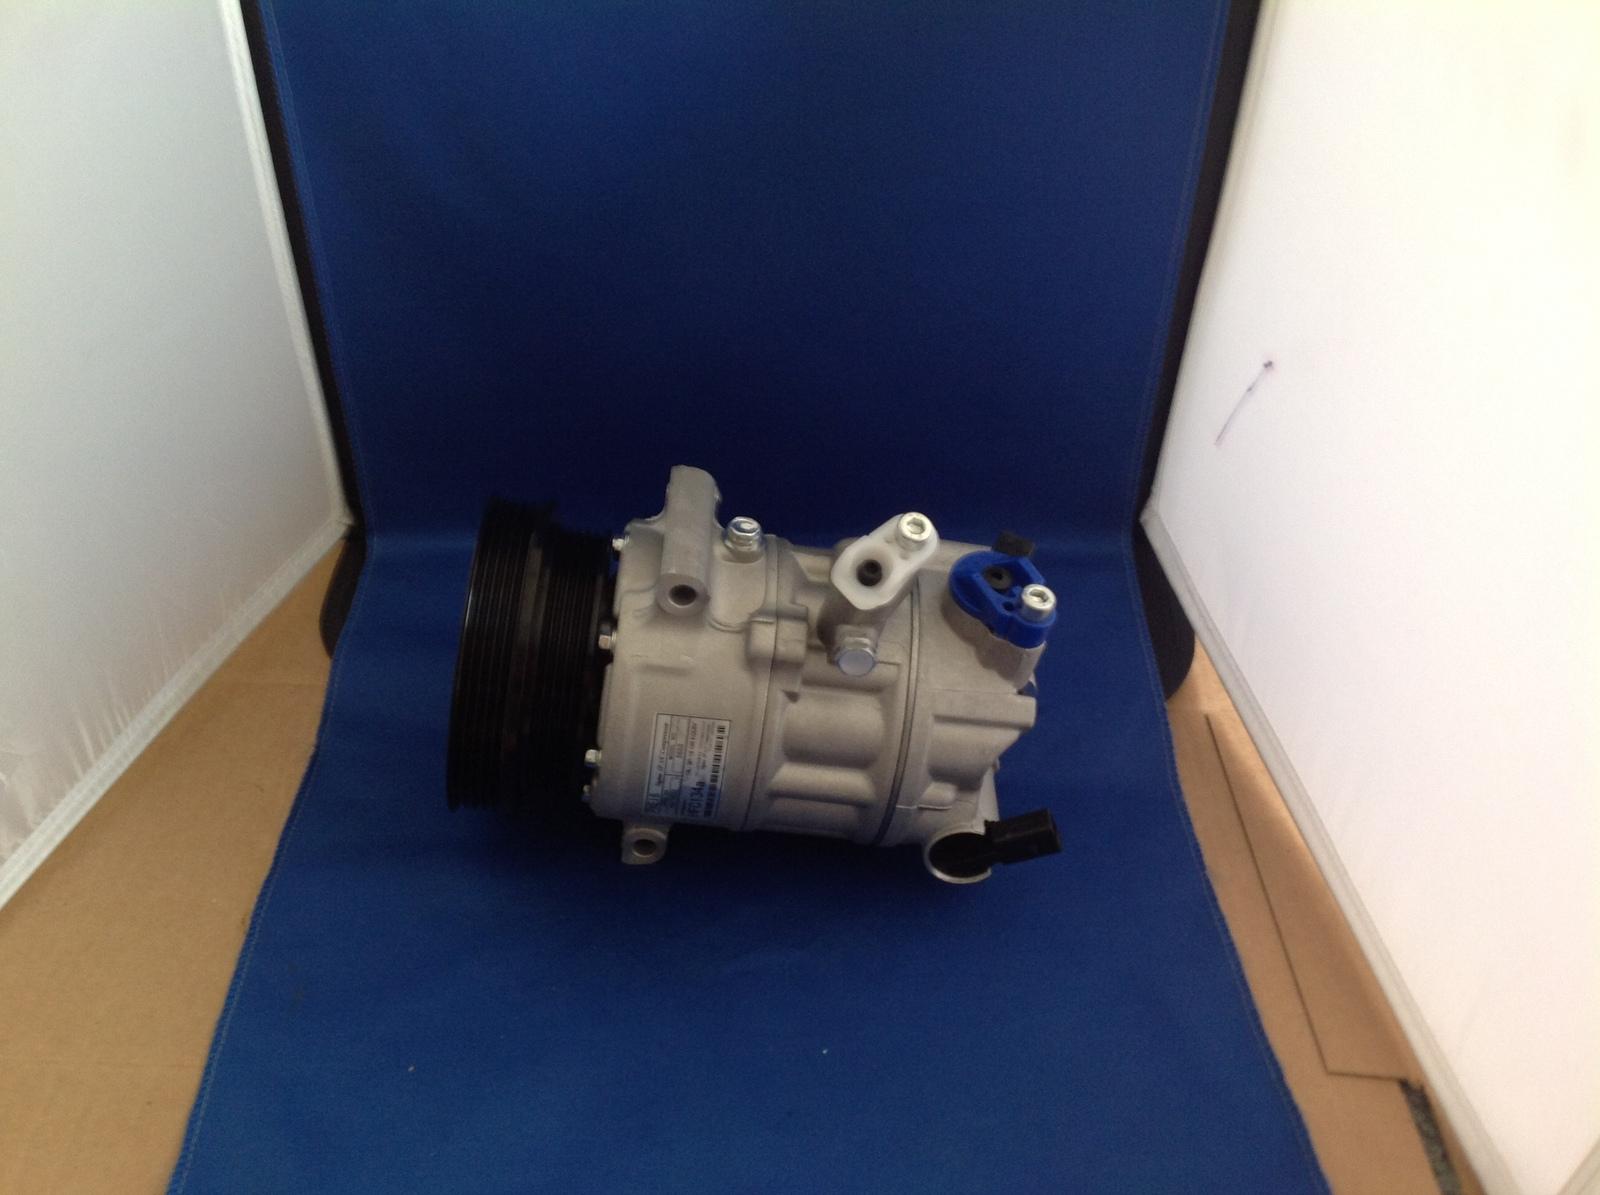 2010-2014 VW Volkswagen Golf 2.5 Auto AC Air Conditioning Compressor Part